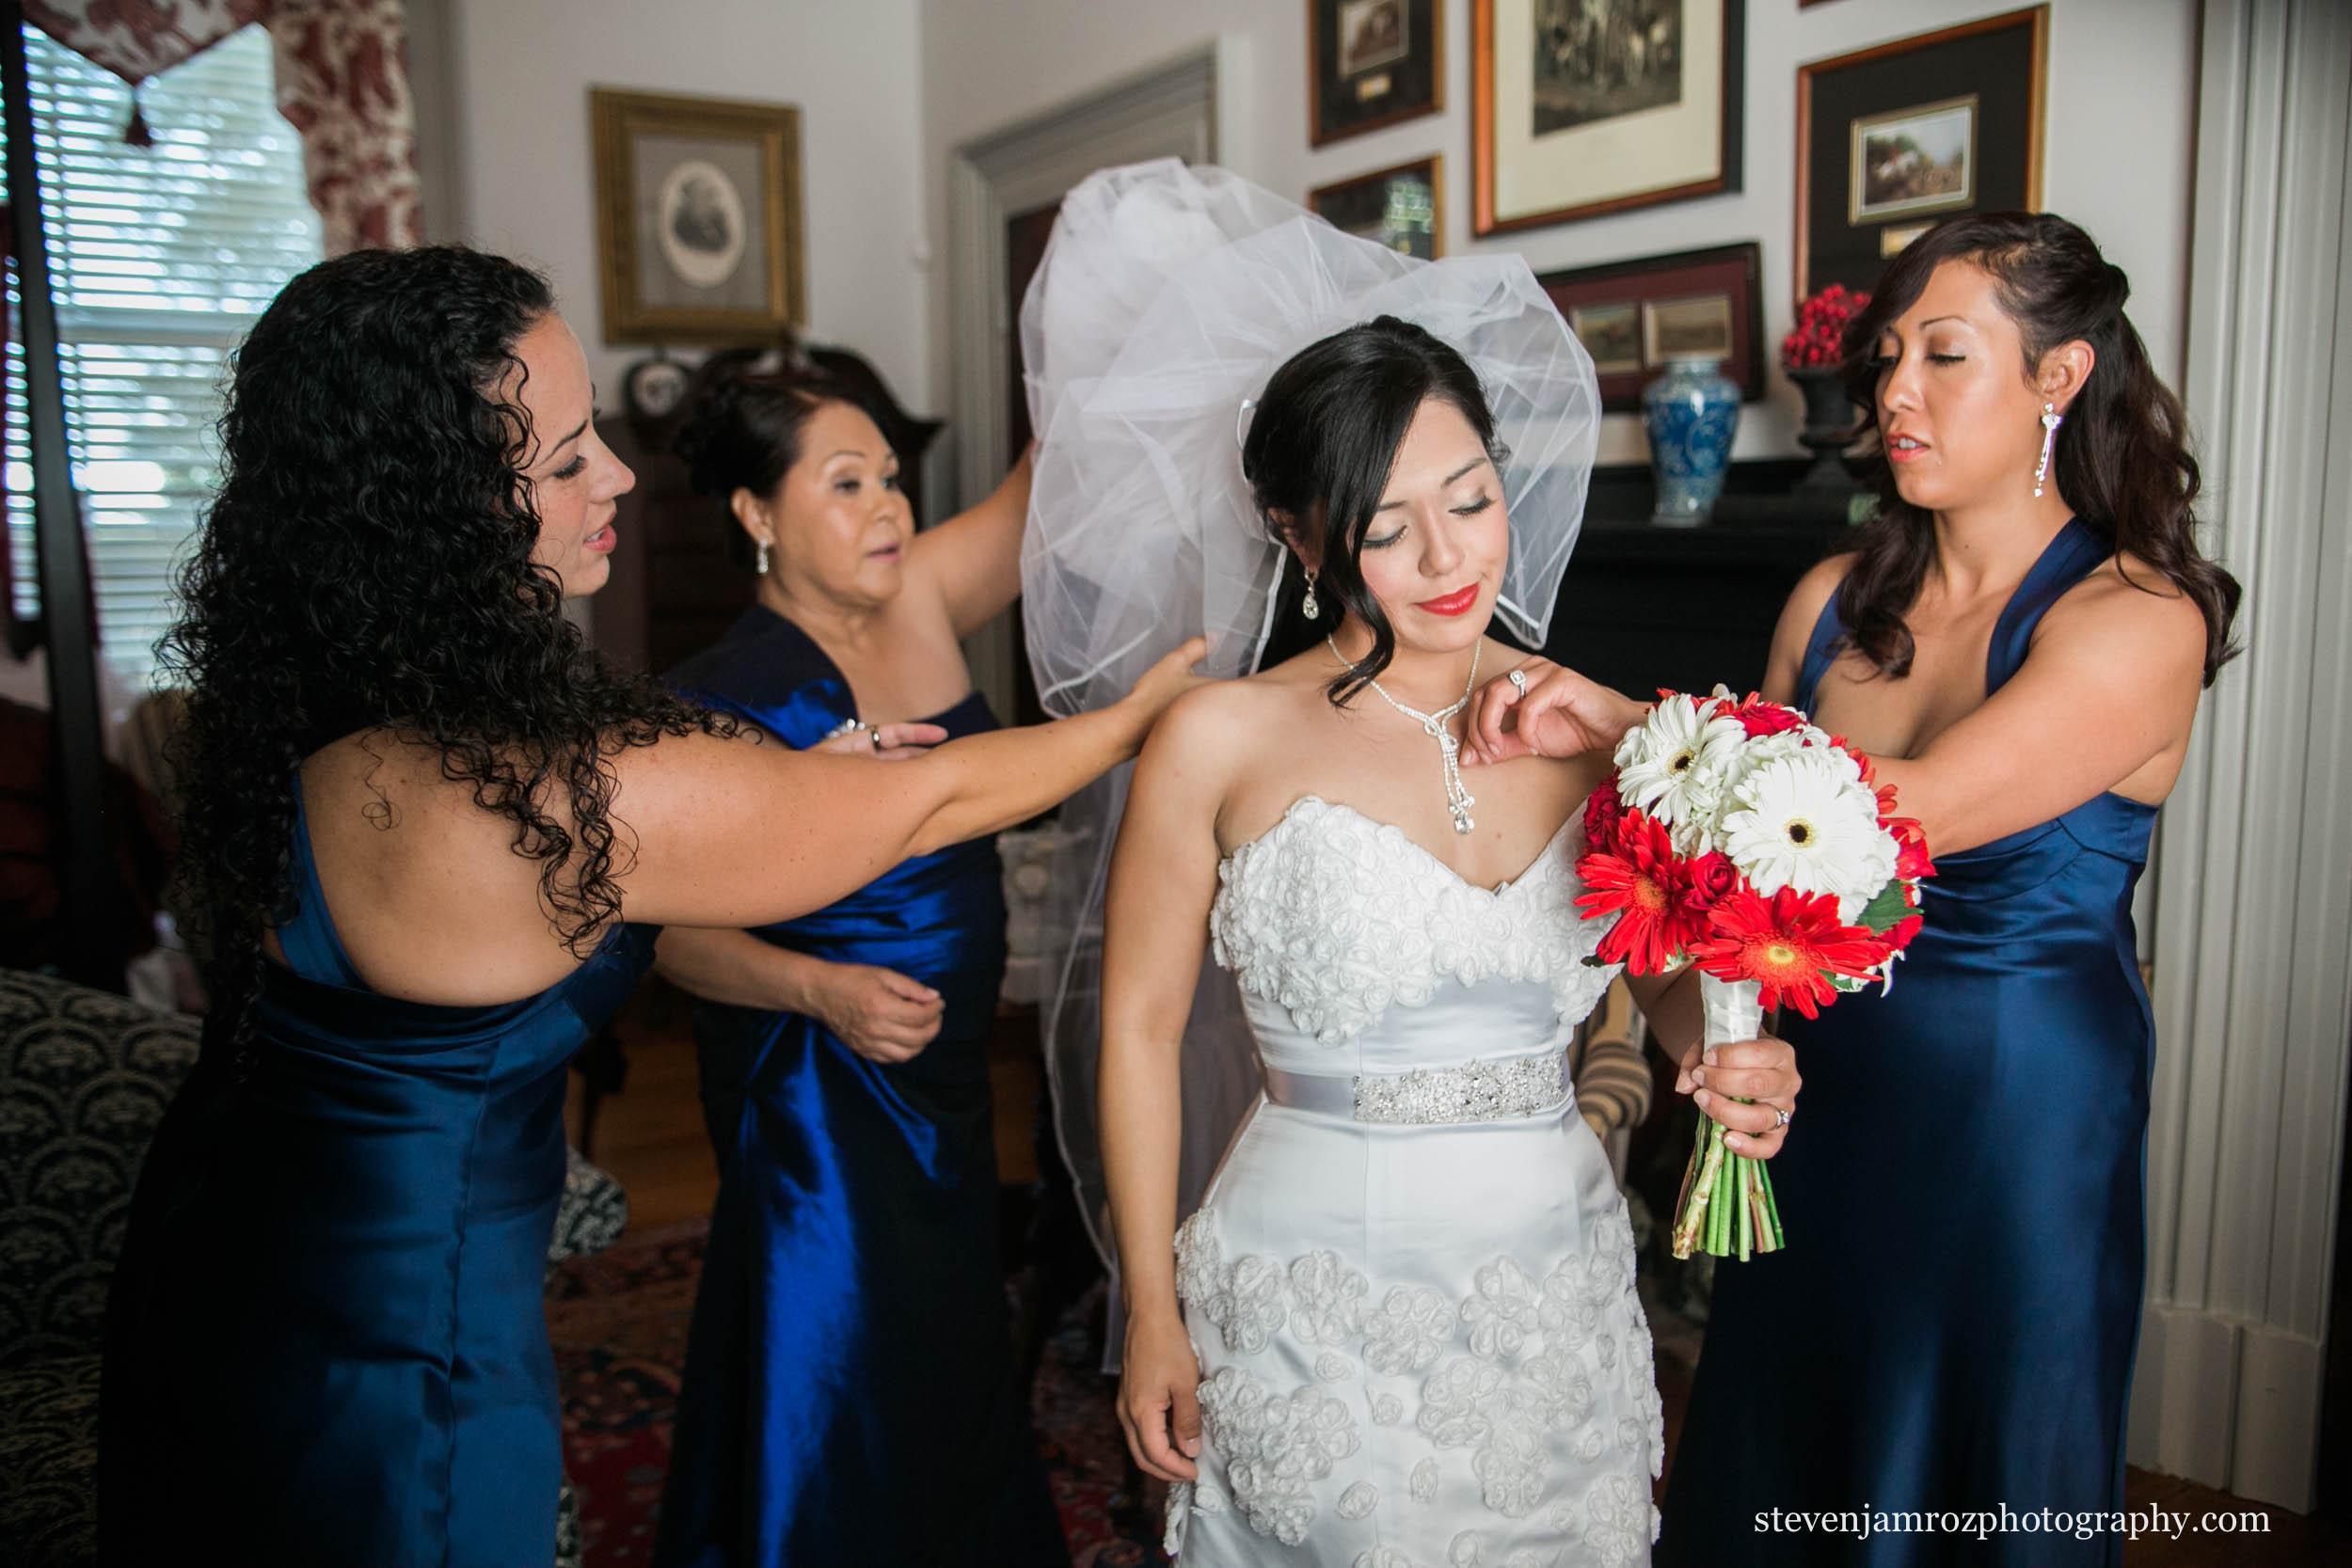 blue-dresses-bridesmaids-raleigh-nc-steven-jamroz-photography-0053.jpg